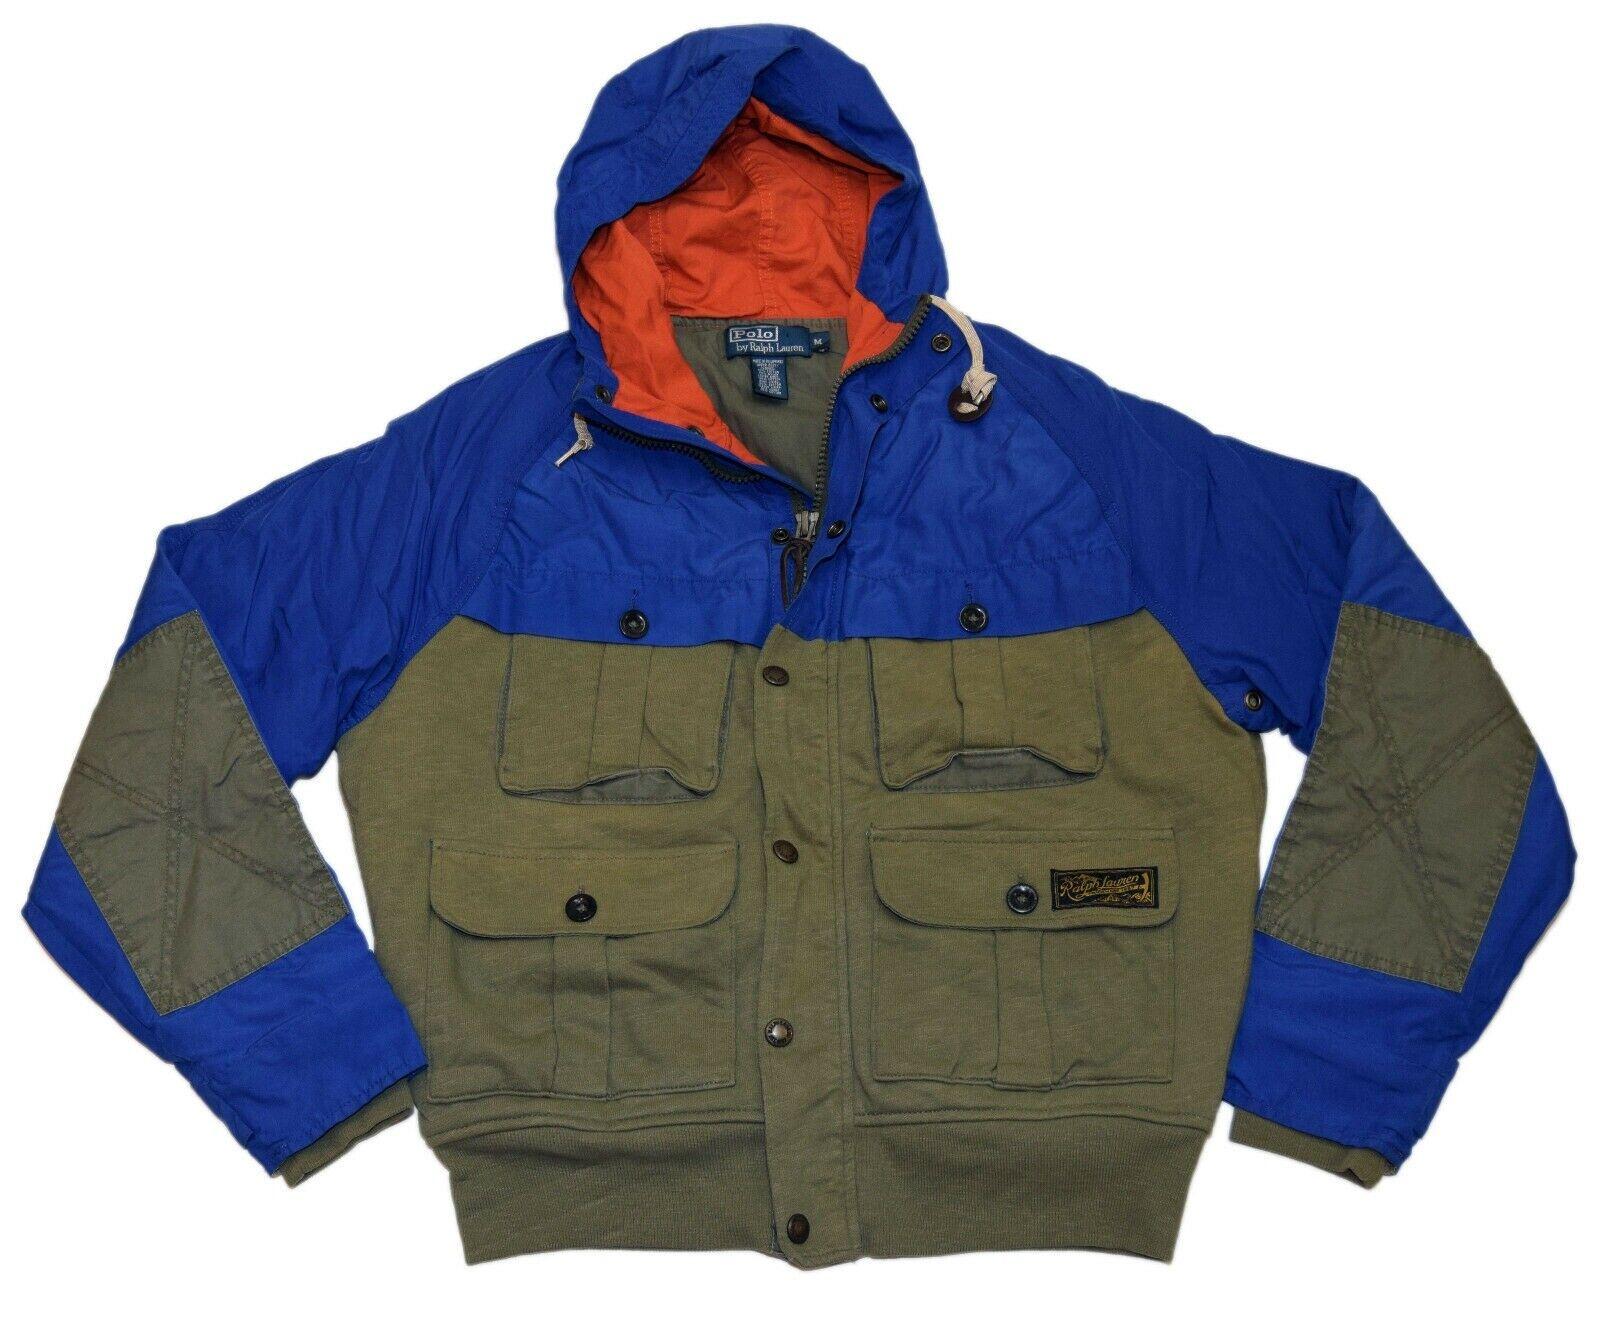 348-polo-ralph-lauren-mens-cotton-hooded-jacket-coat-olive-green-blue-medium